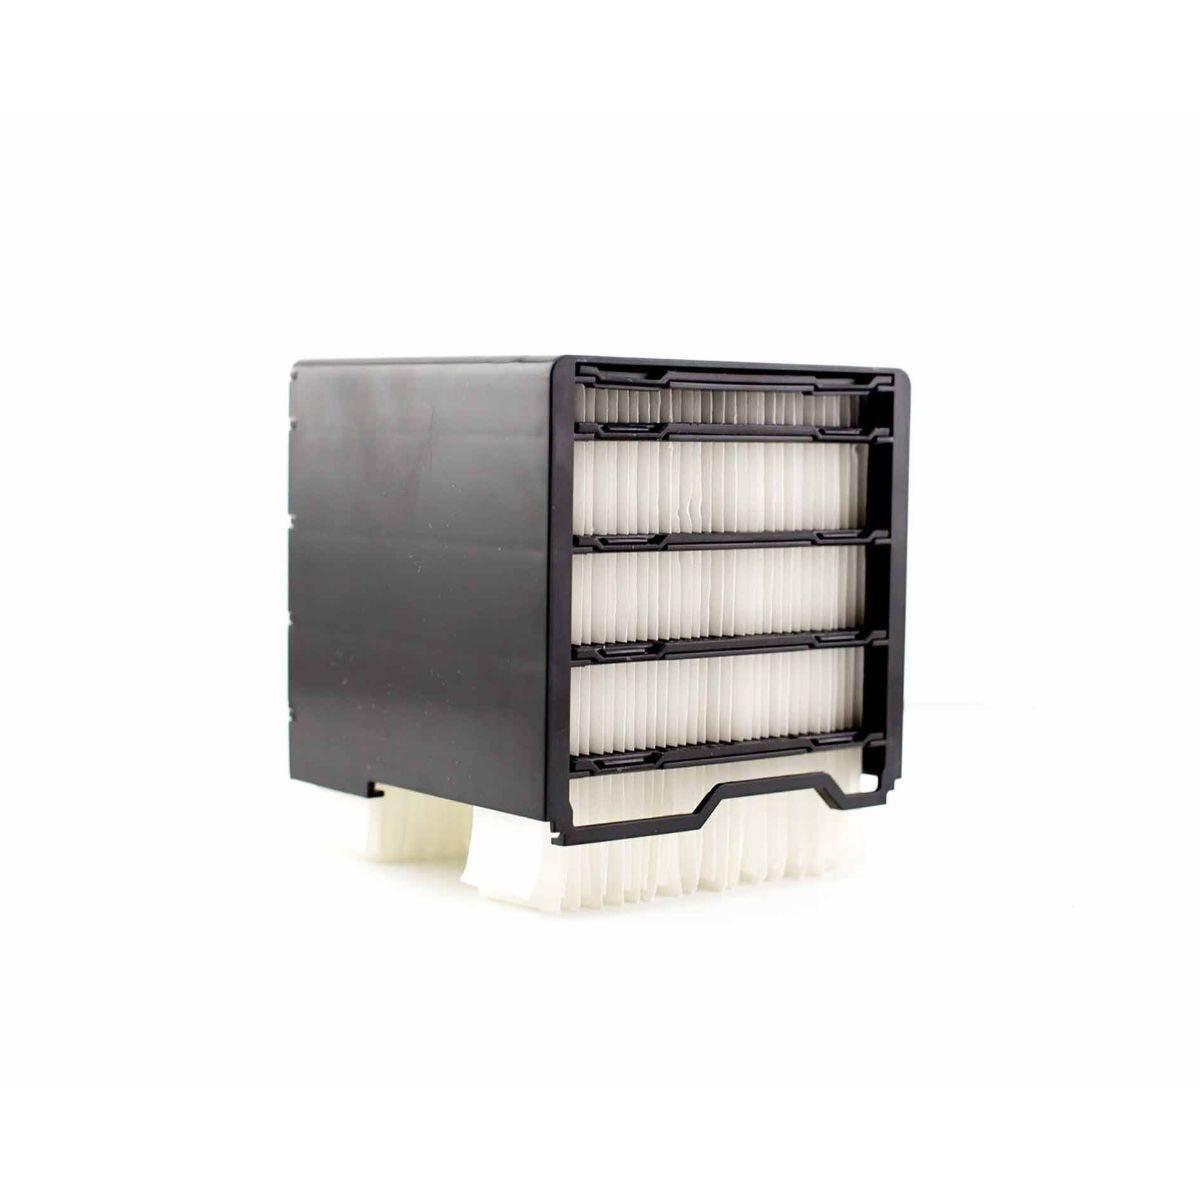 JML Arctic Air Portable Air Cooler and Humidifier Replacement Filter